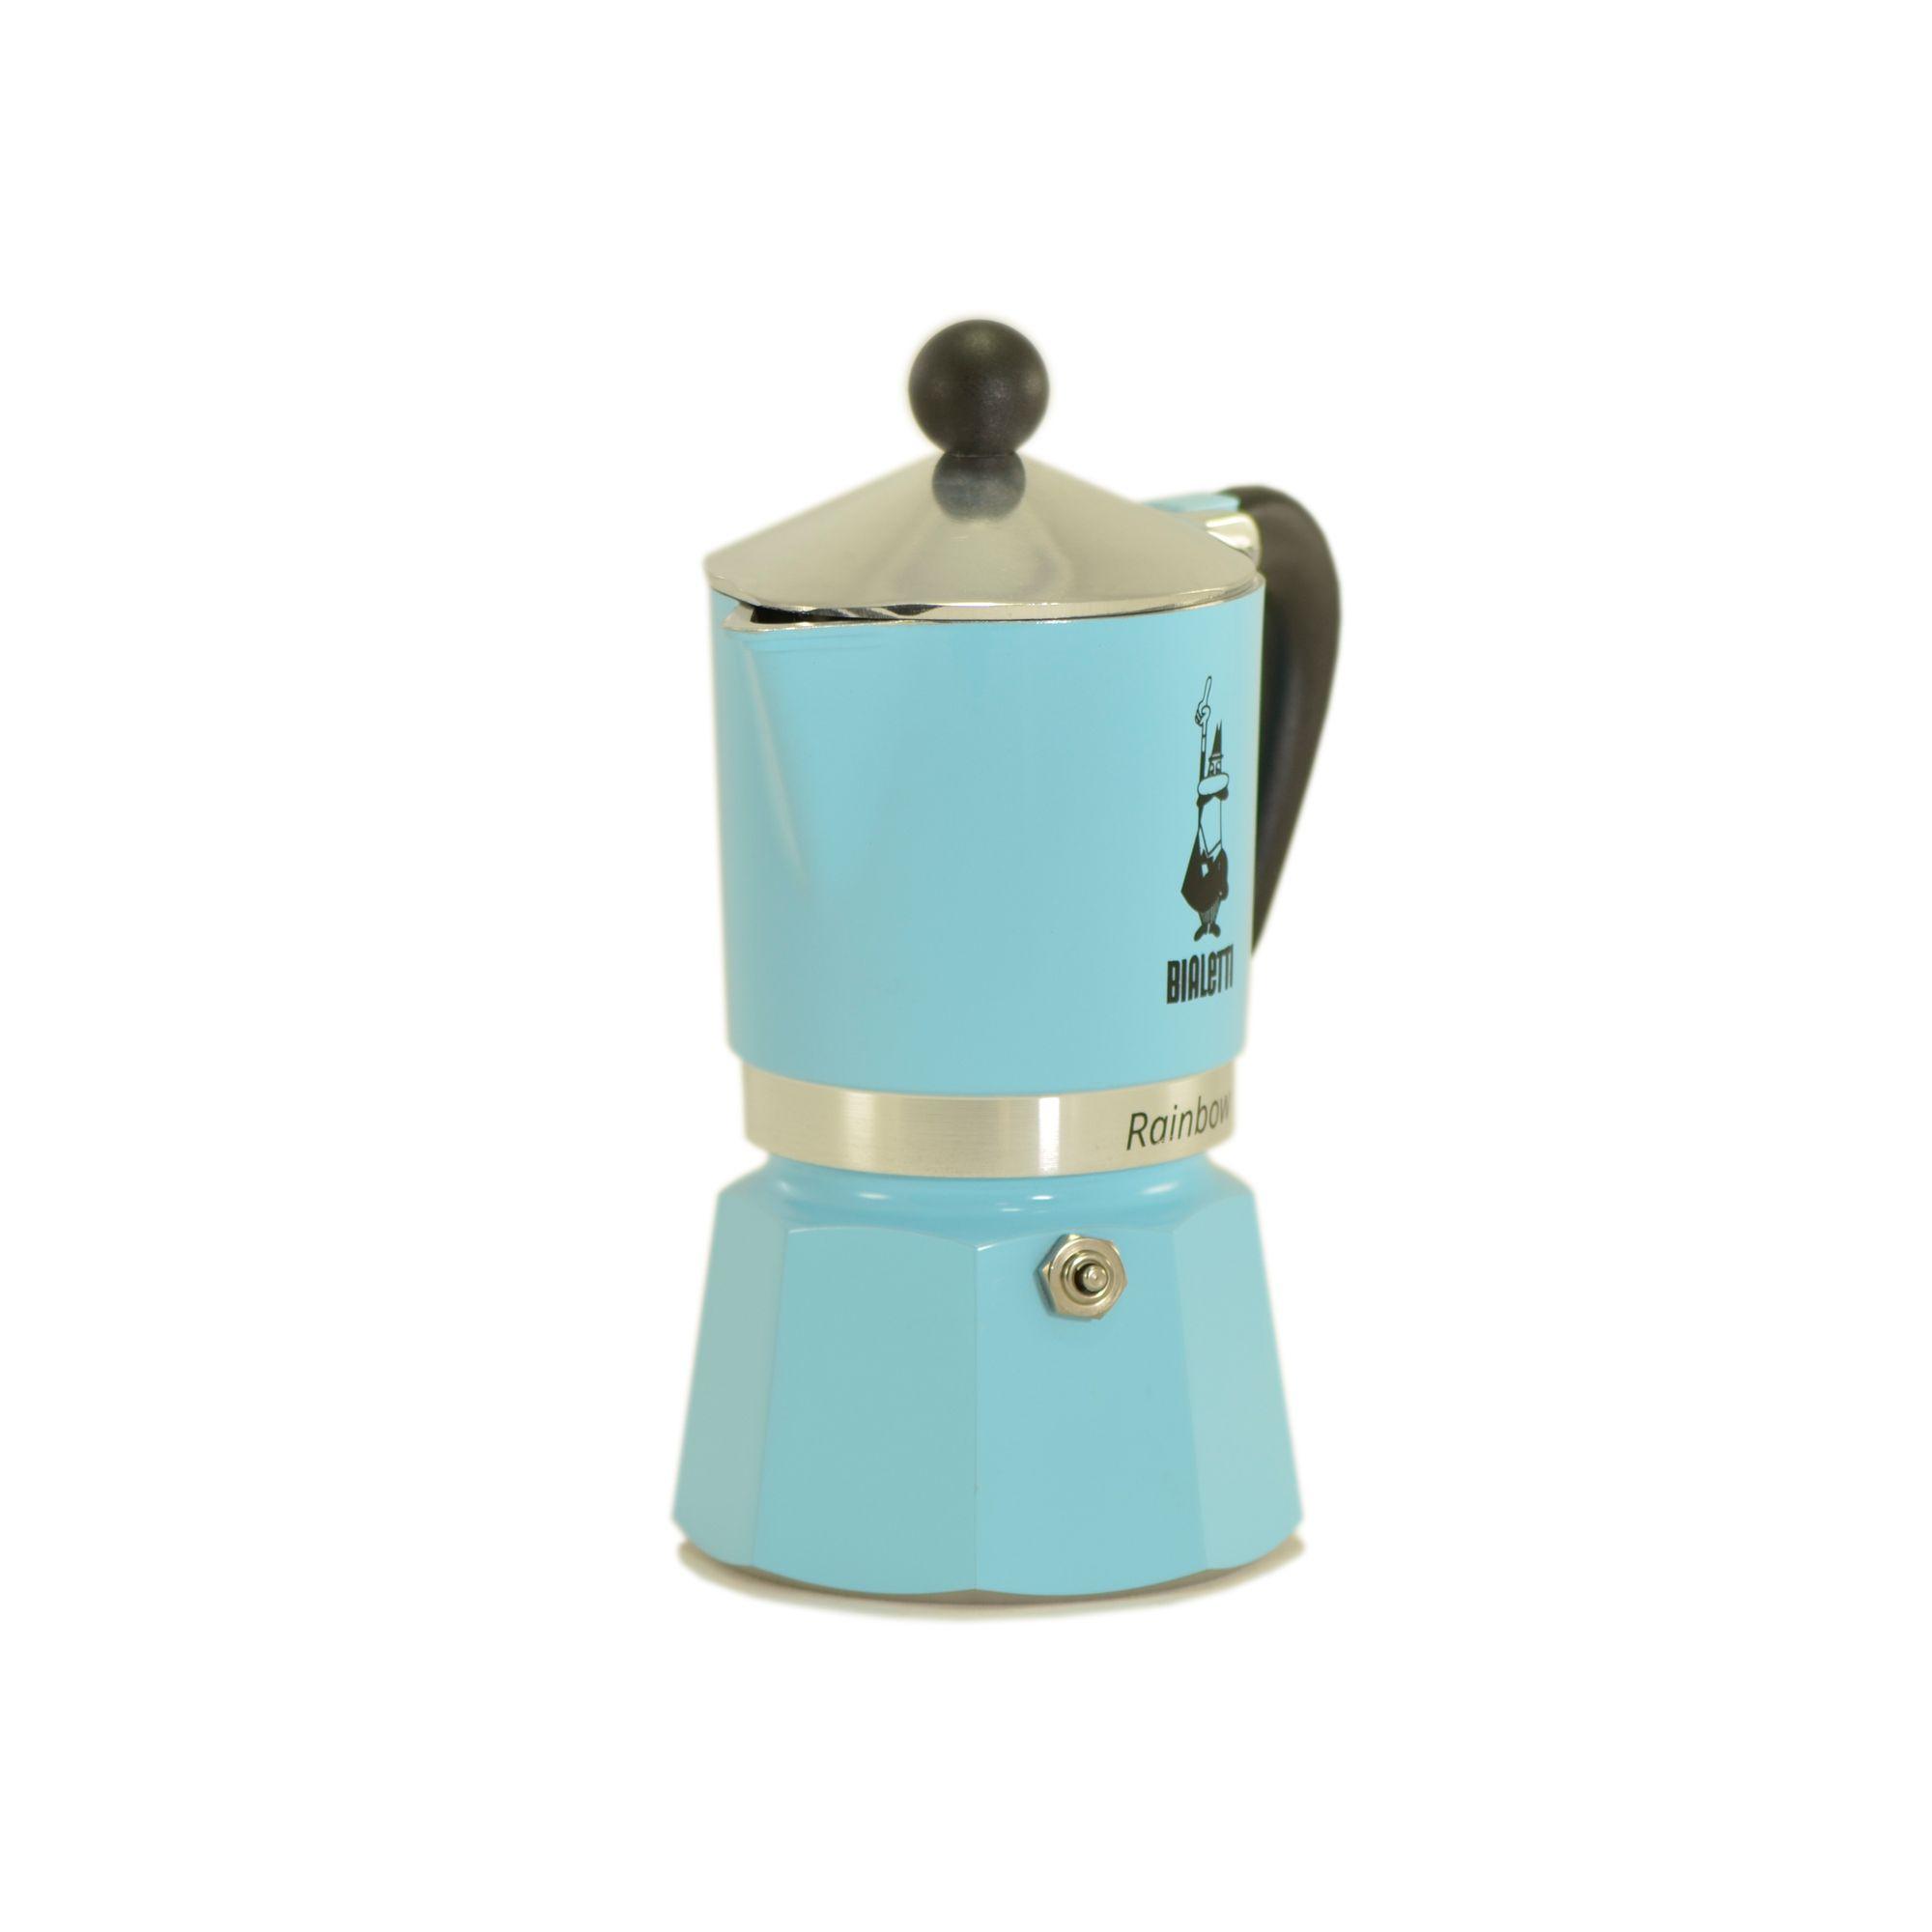 Cafeteira Rainbow Moka Azul - Bialetti